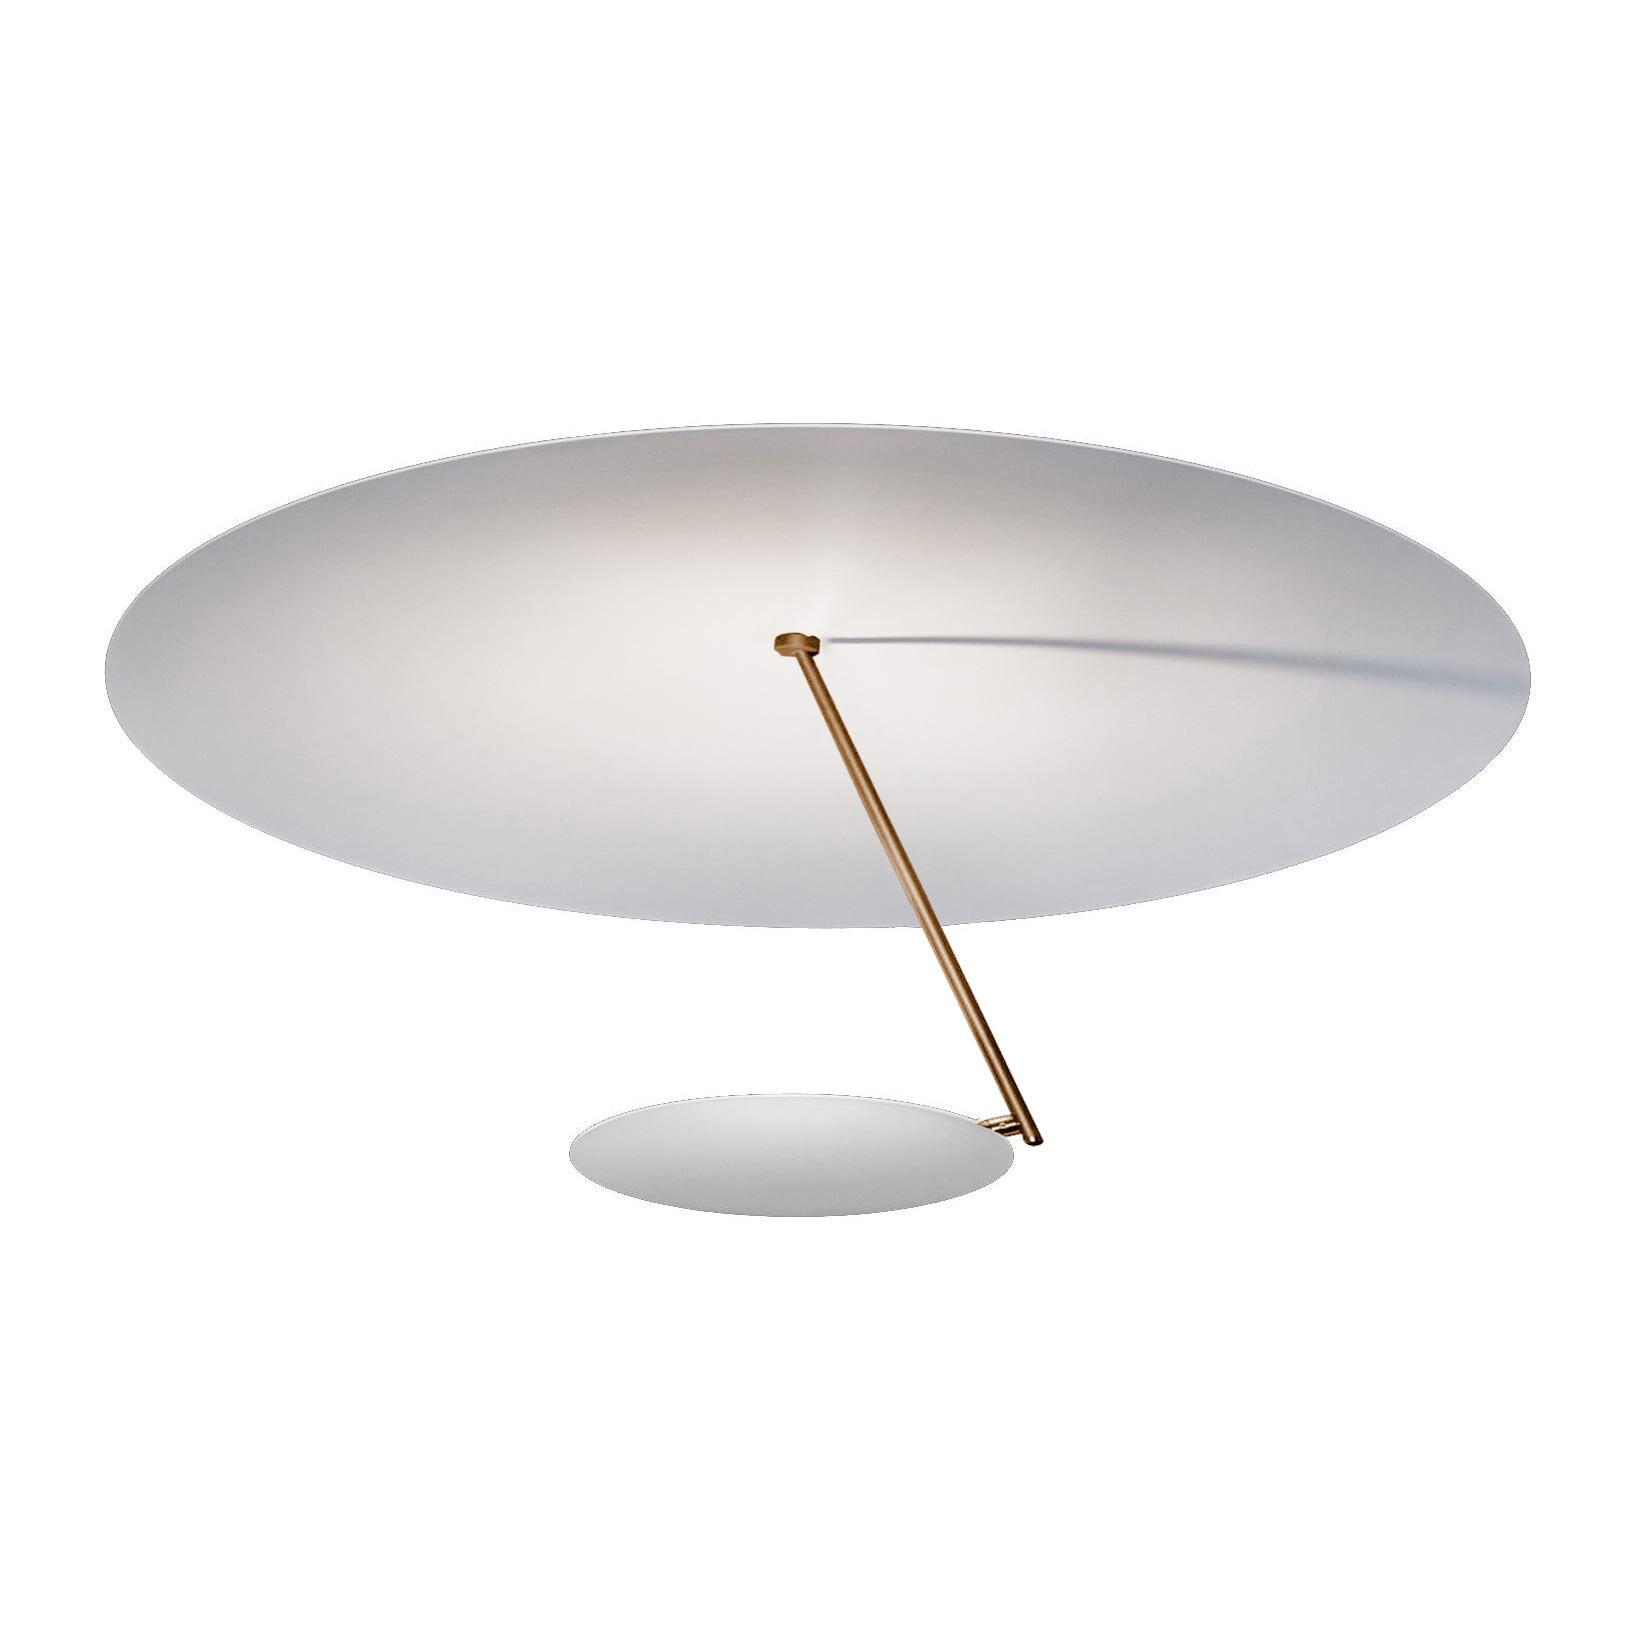 Catellani & Smith Plafonnier LED Lederam C180 - blanc/base blanc H3,5cm x Ø9cm/2700K/2550lm/CRI80/H 35cm/Ø 80cm/barre or/disque Ø25cm blanc